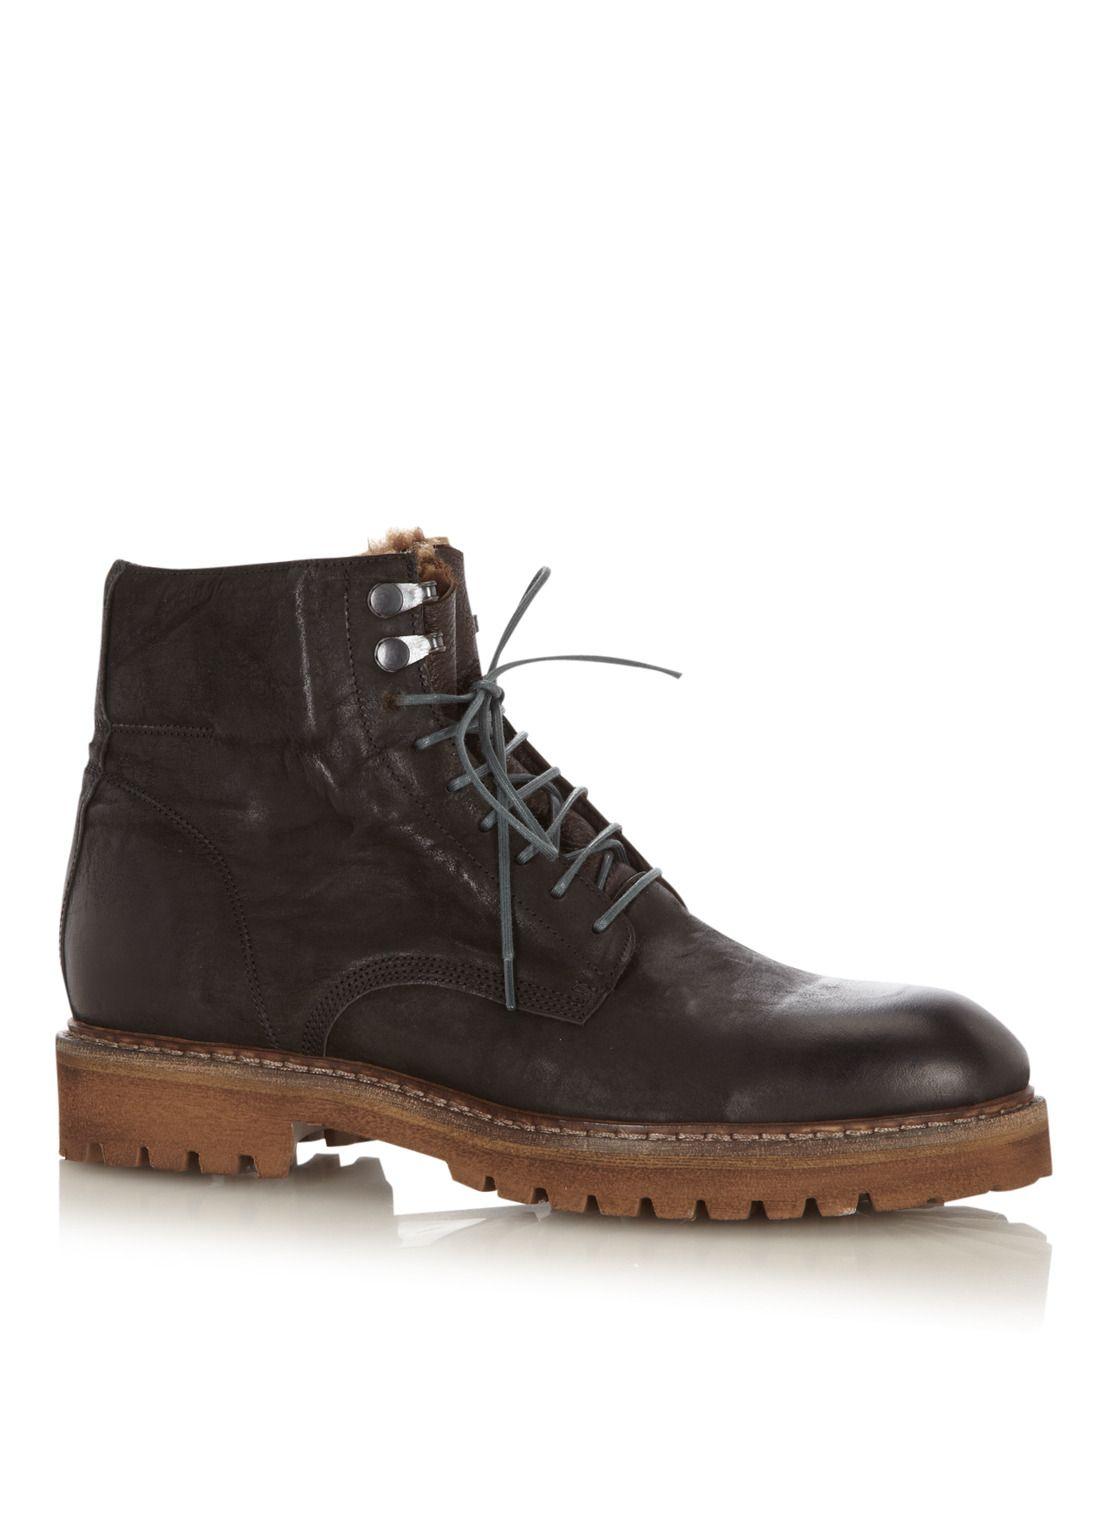 02e86c210 Atelier do Sapato | Men's Floor Wear | Timberland boots, Shoes e How ...